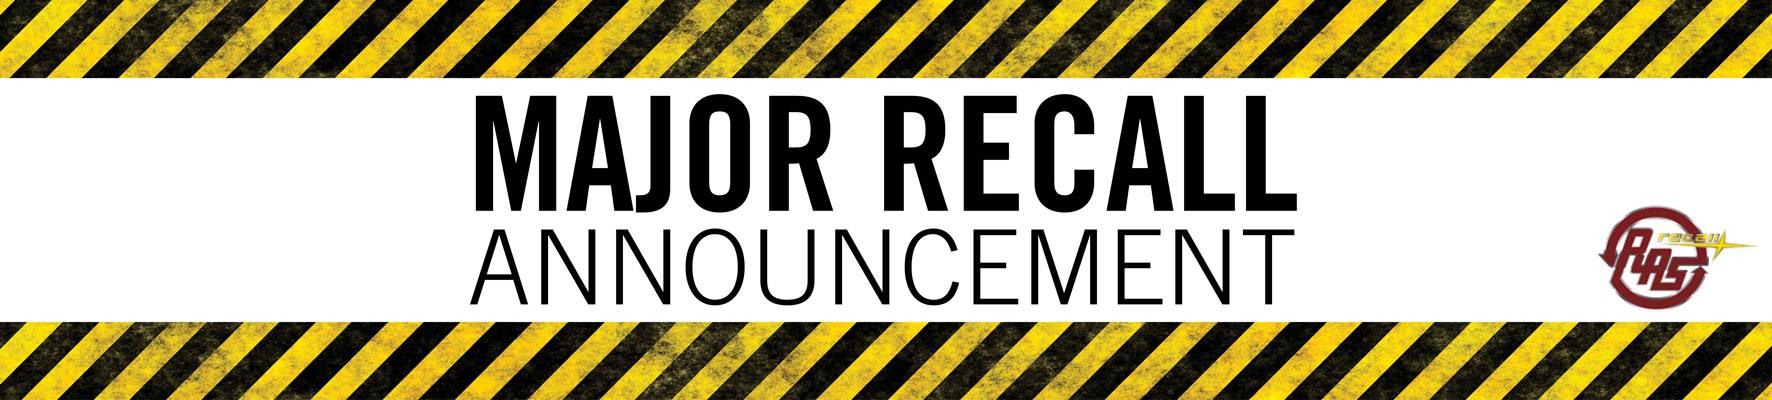 Major Recall Announcement!!